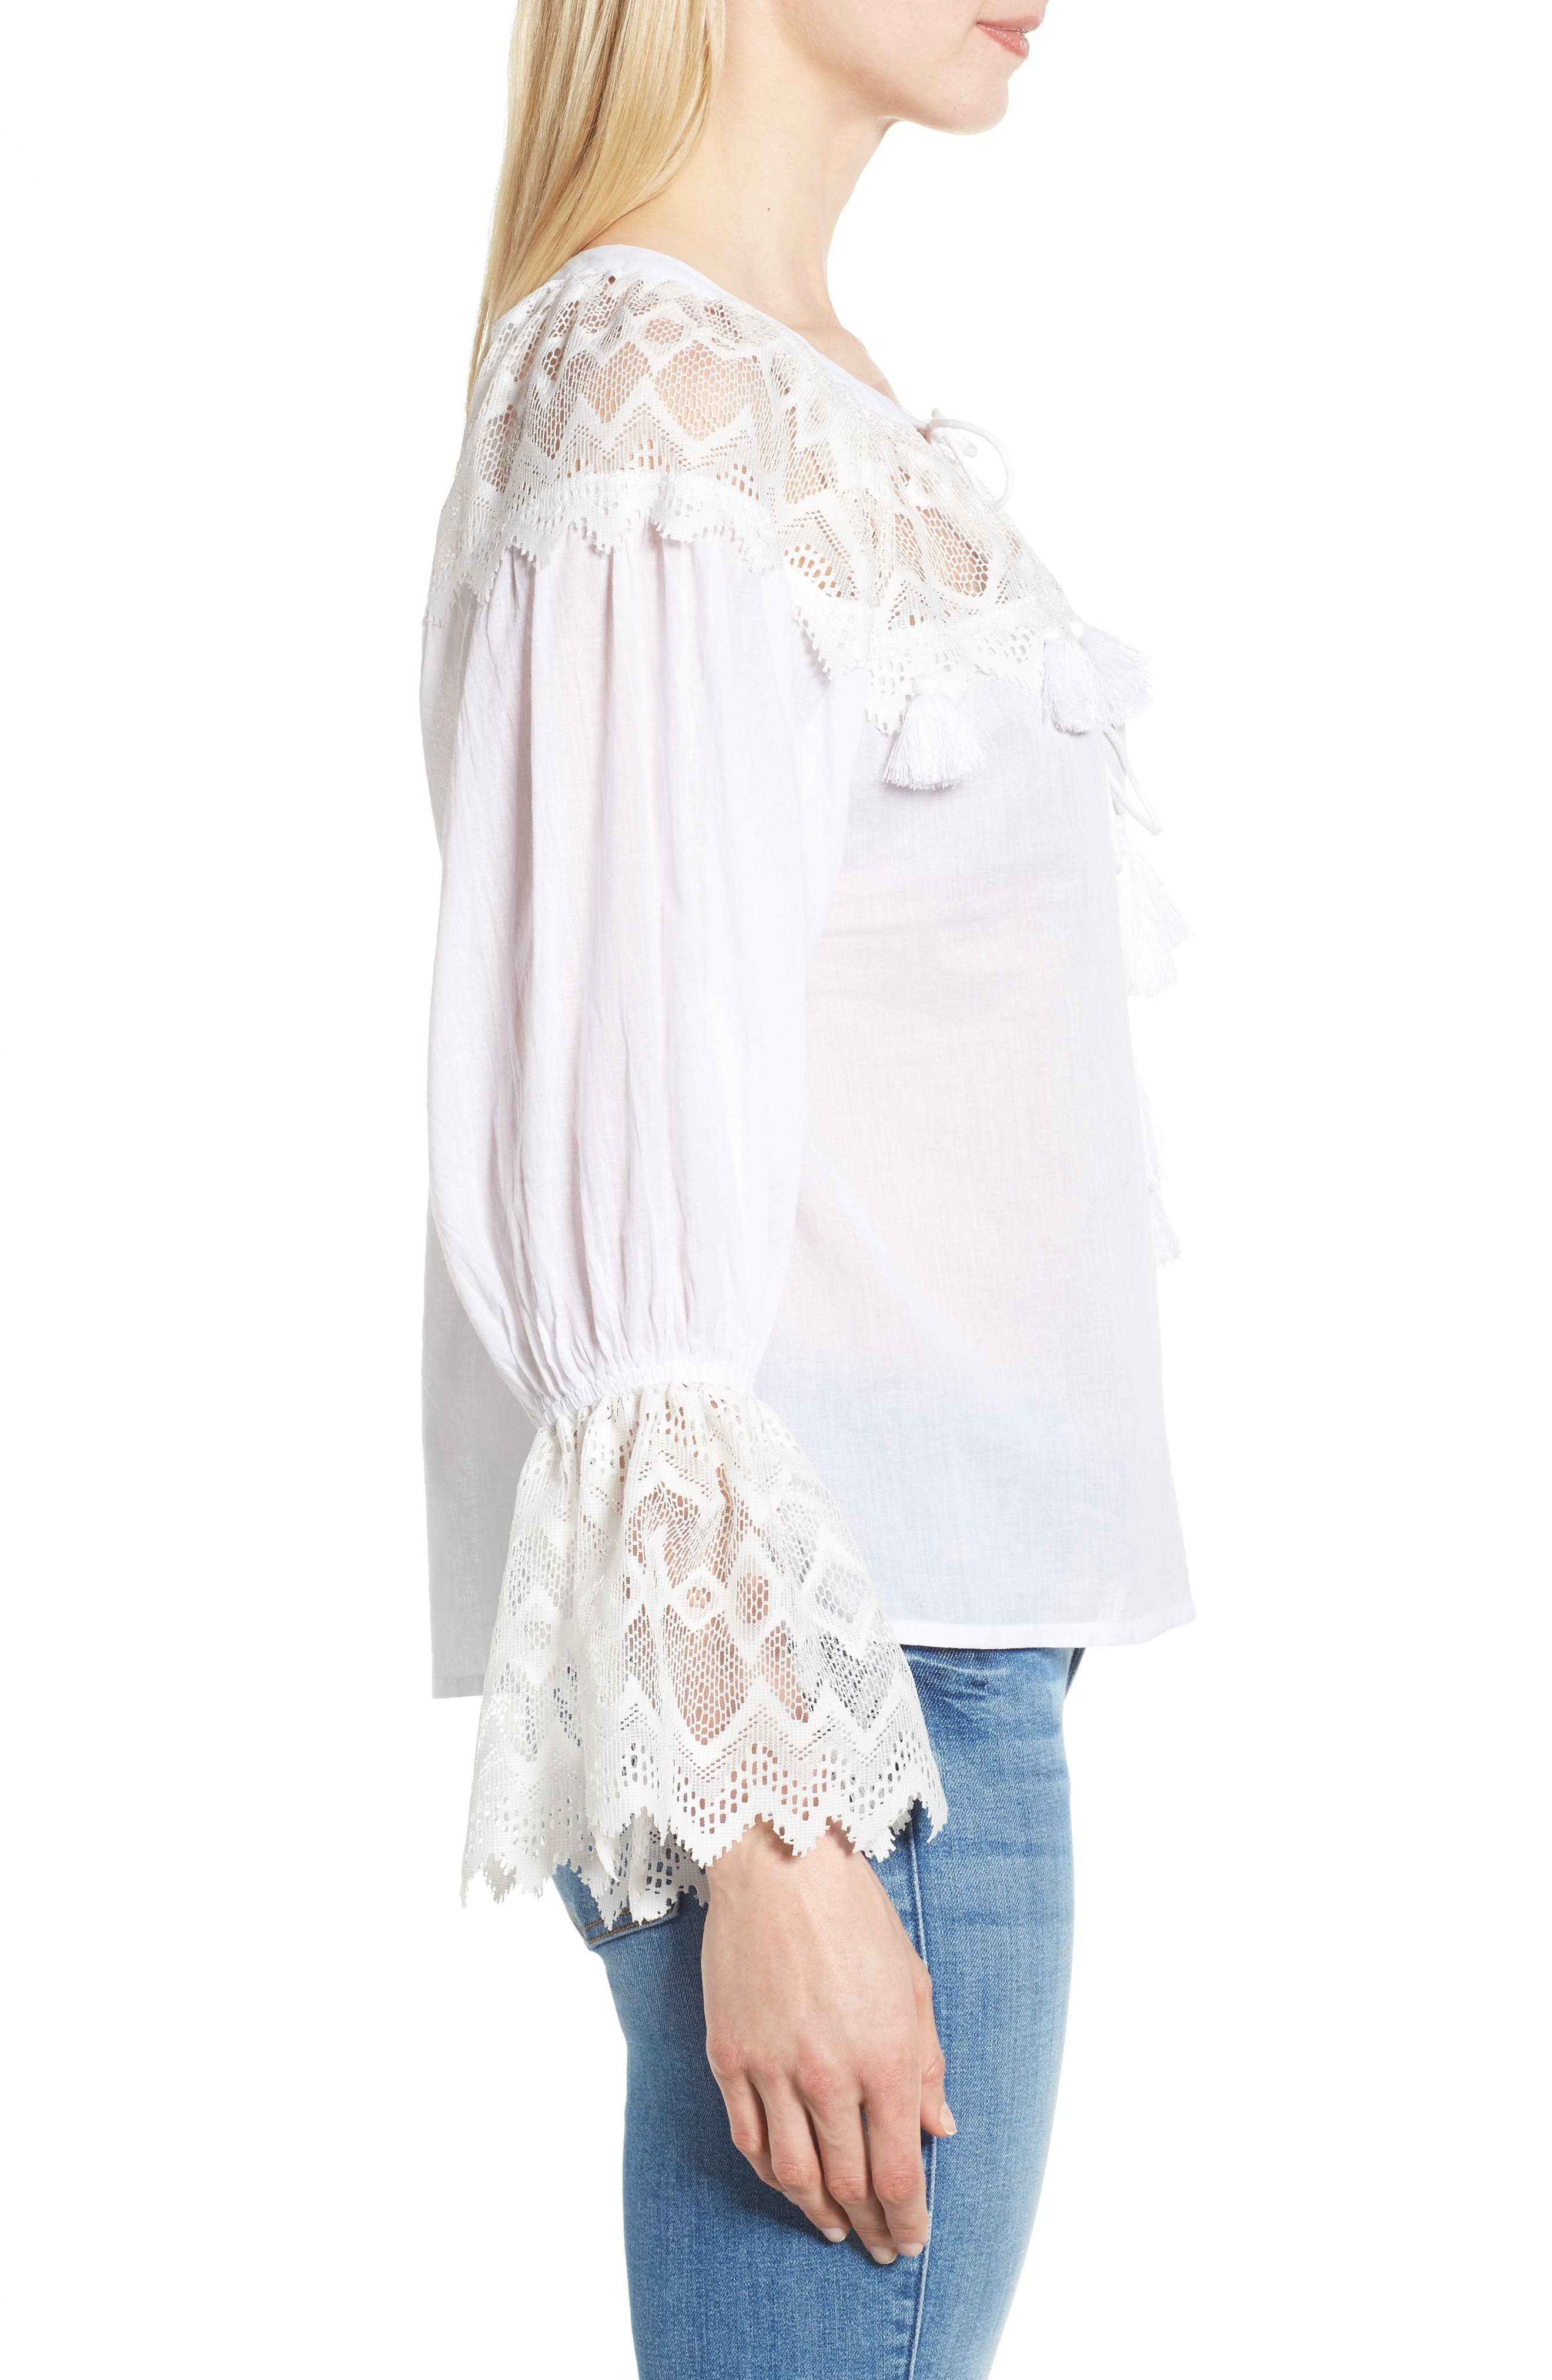 Berkley White Lace Cotton Blend Top,                             Alternate thumbnail 3, color,                             WHITE